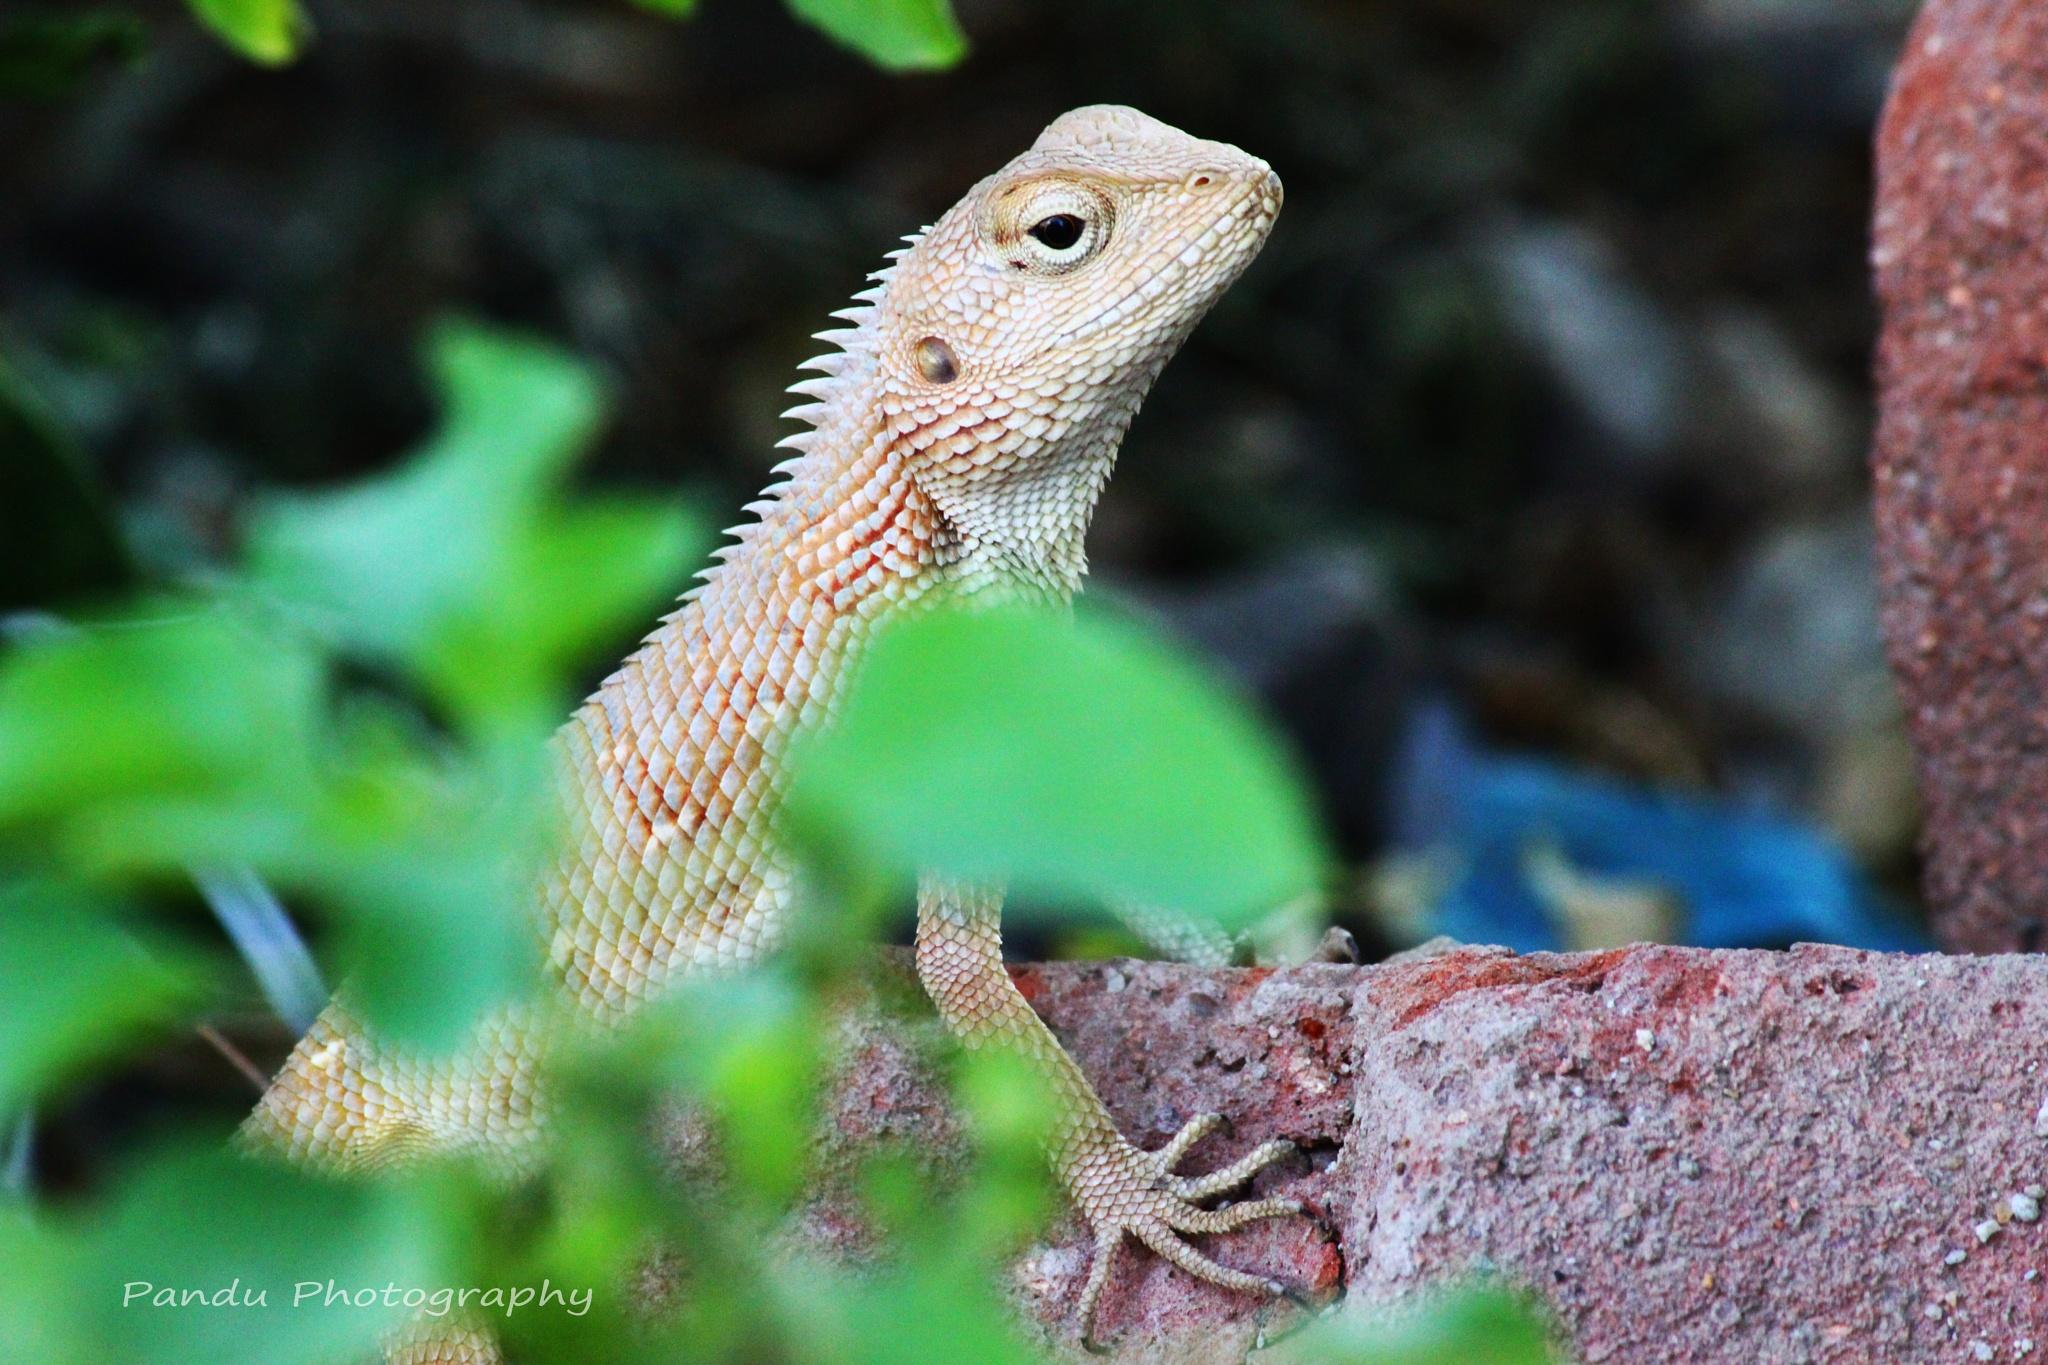 batch of lizard by Naveenkumar Pandu